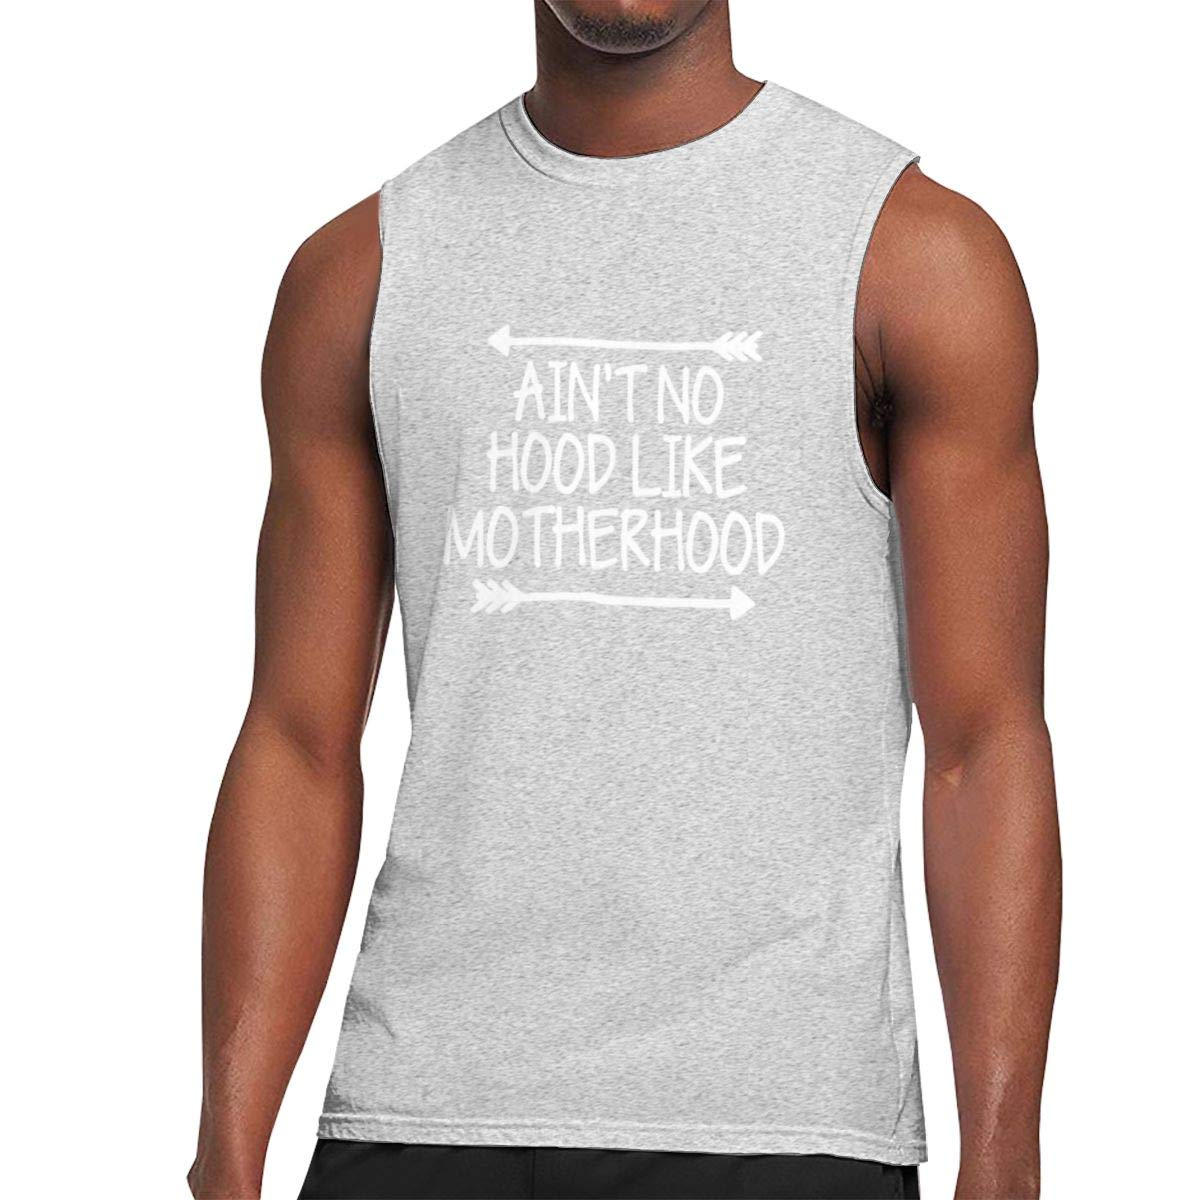 Aint No Hood Like Motherhood Sleeveless Tanks Tops T-Shirts Fit Mens